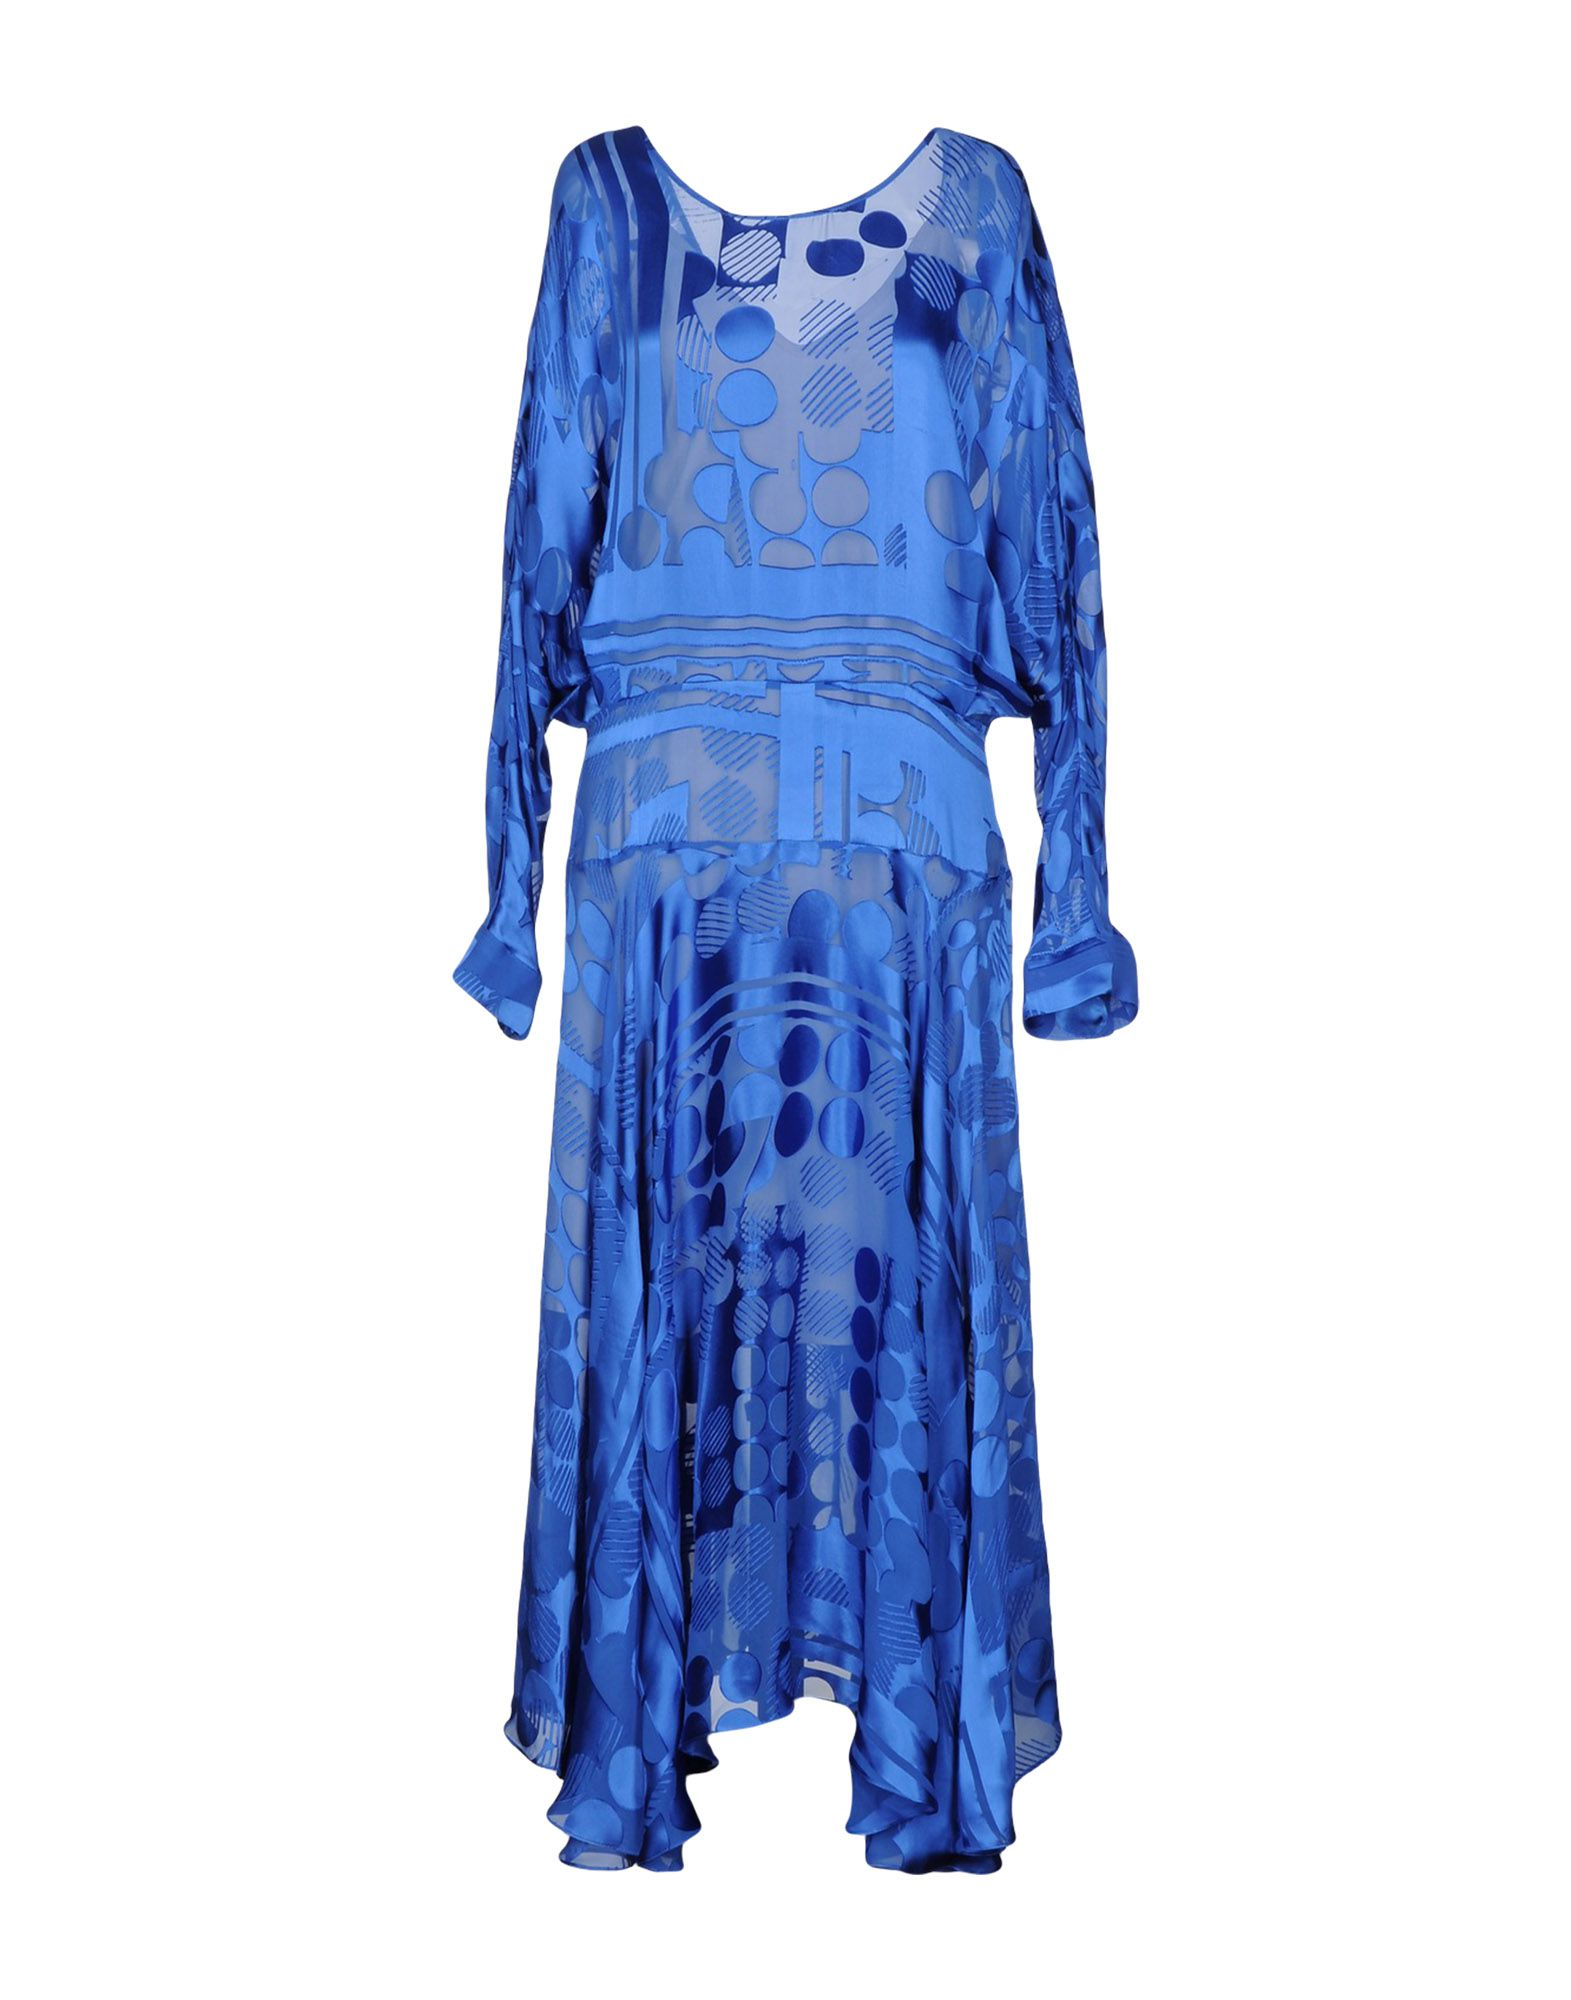 платье preen платье PREEN by THORNTON BREGAZZI Длинное платье